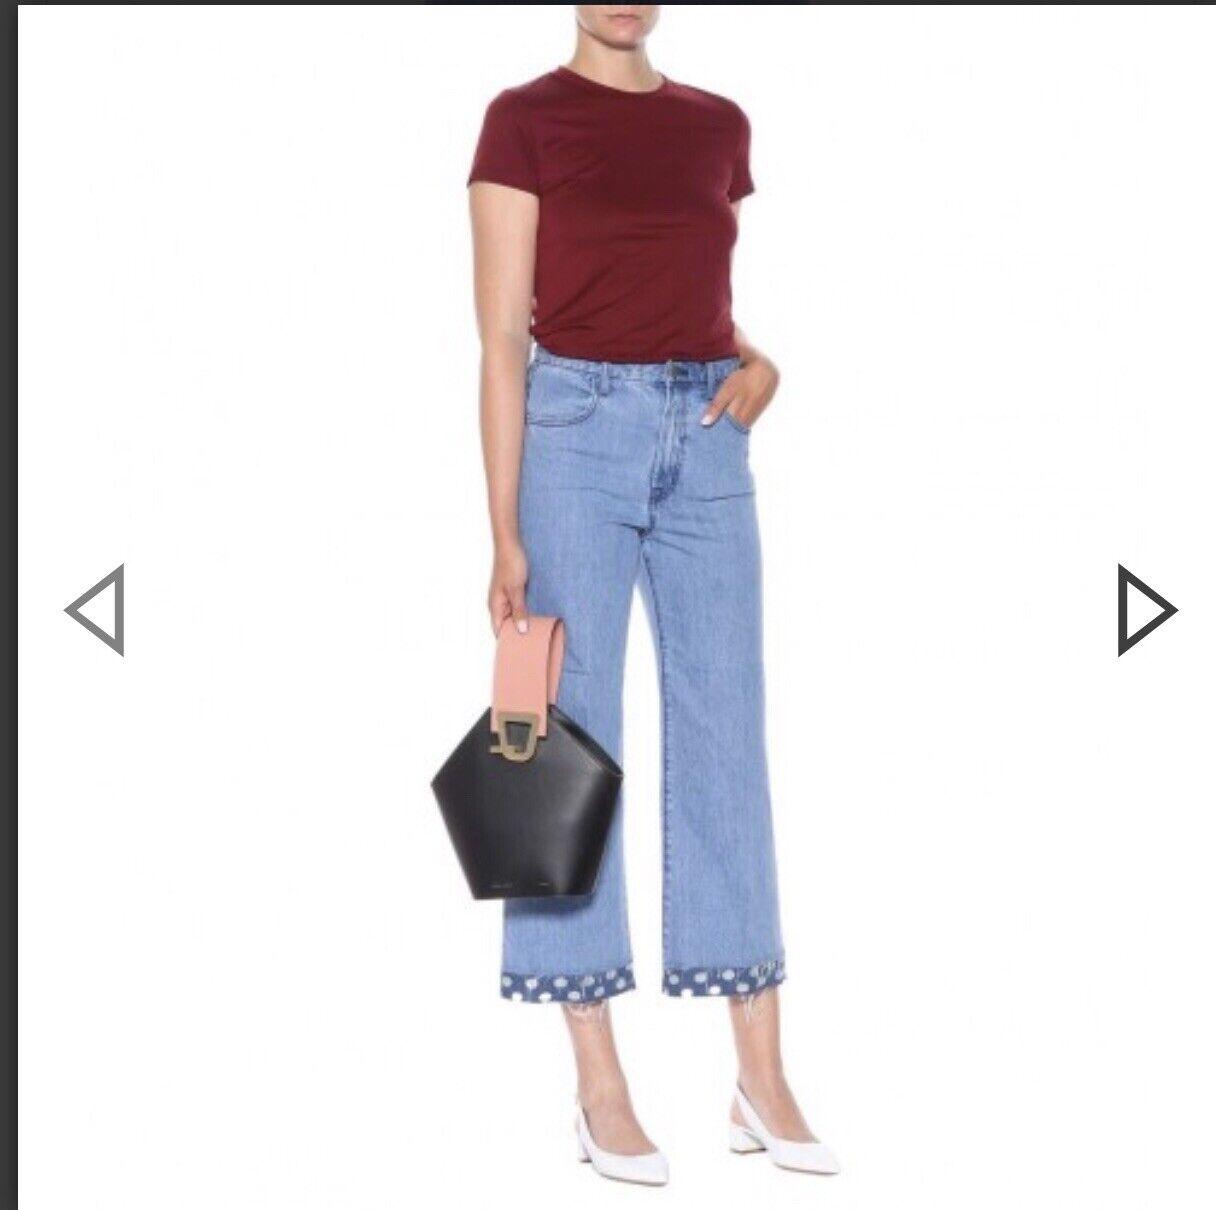 NWT J. Brand Joan High Rise Crop Women's Jeans Denim Light Wash bluee color Sz 25